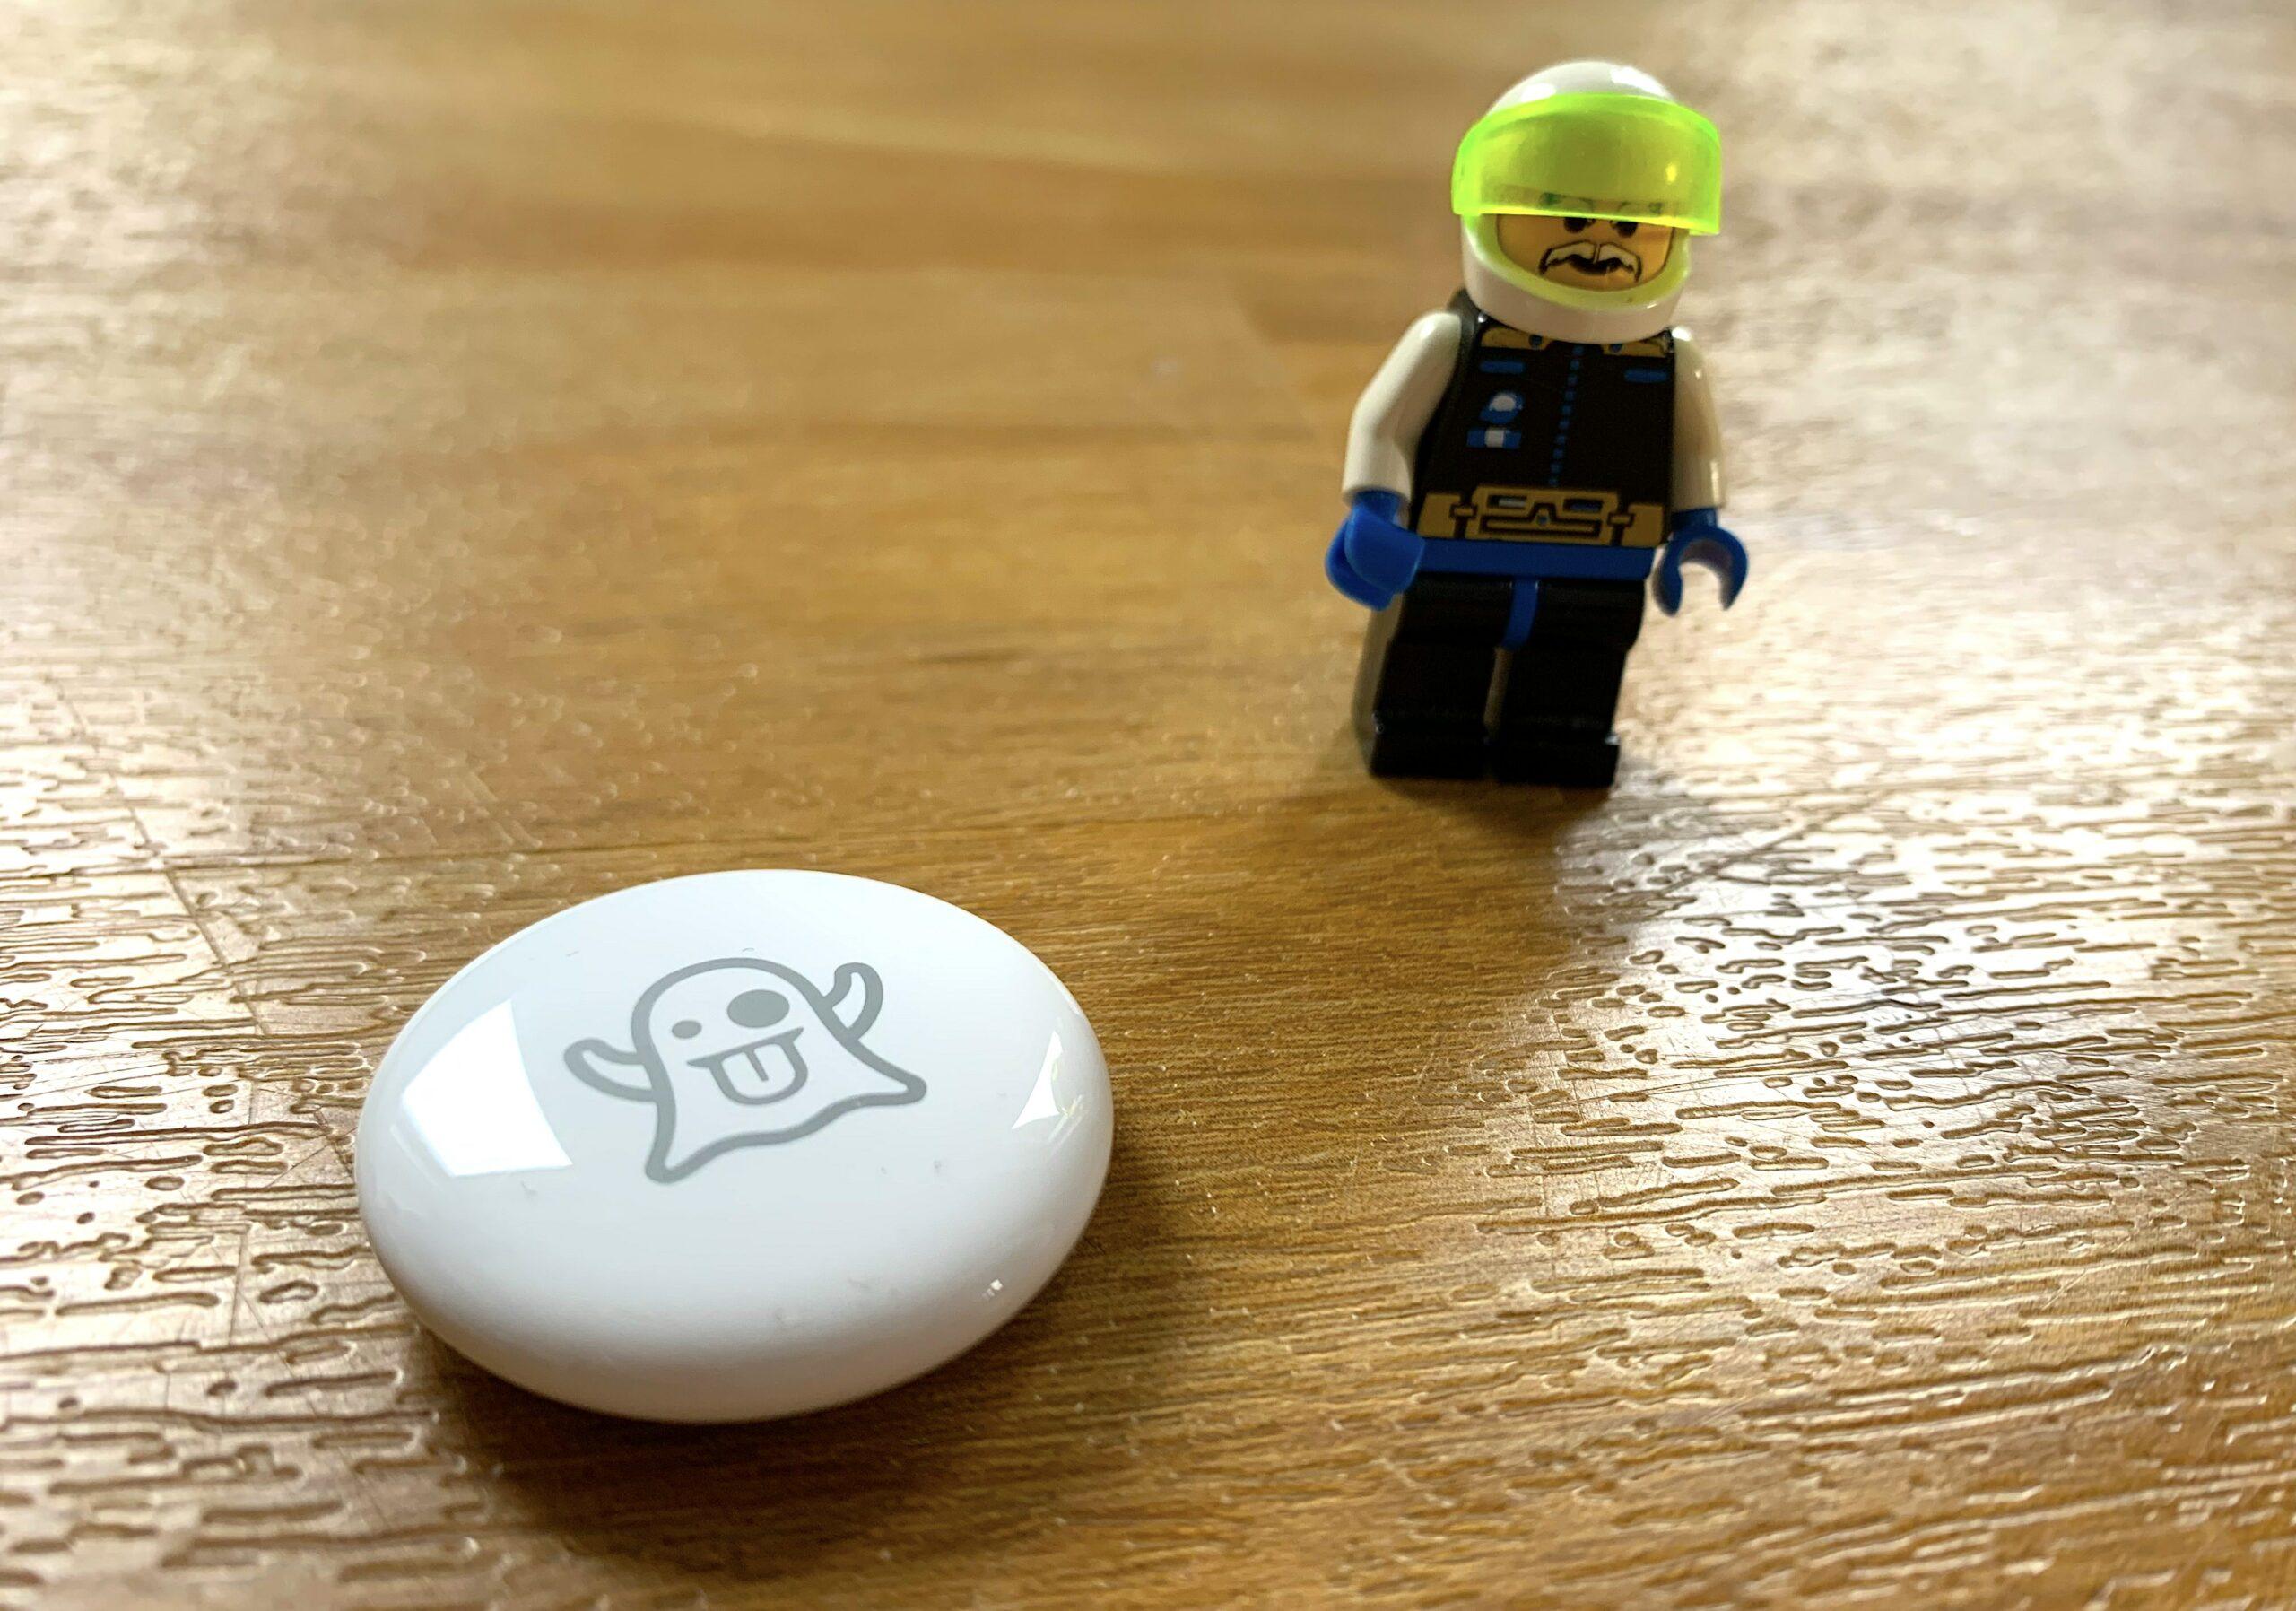 Apple AirTag and Lego